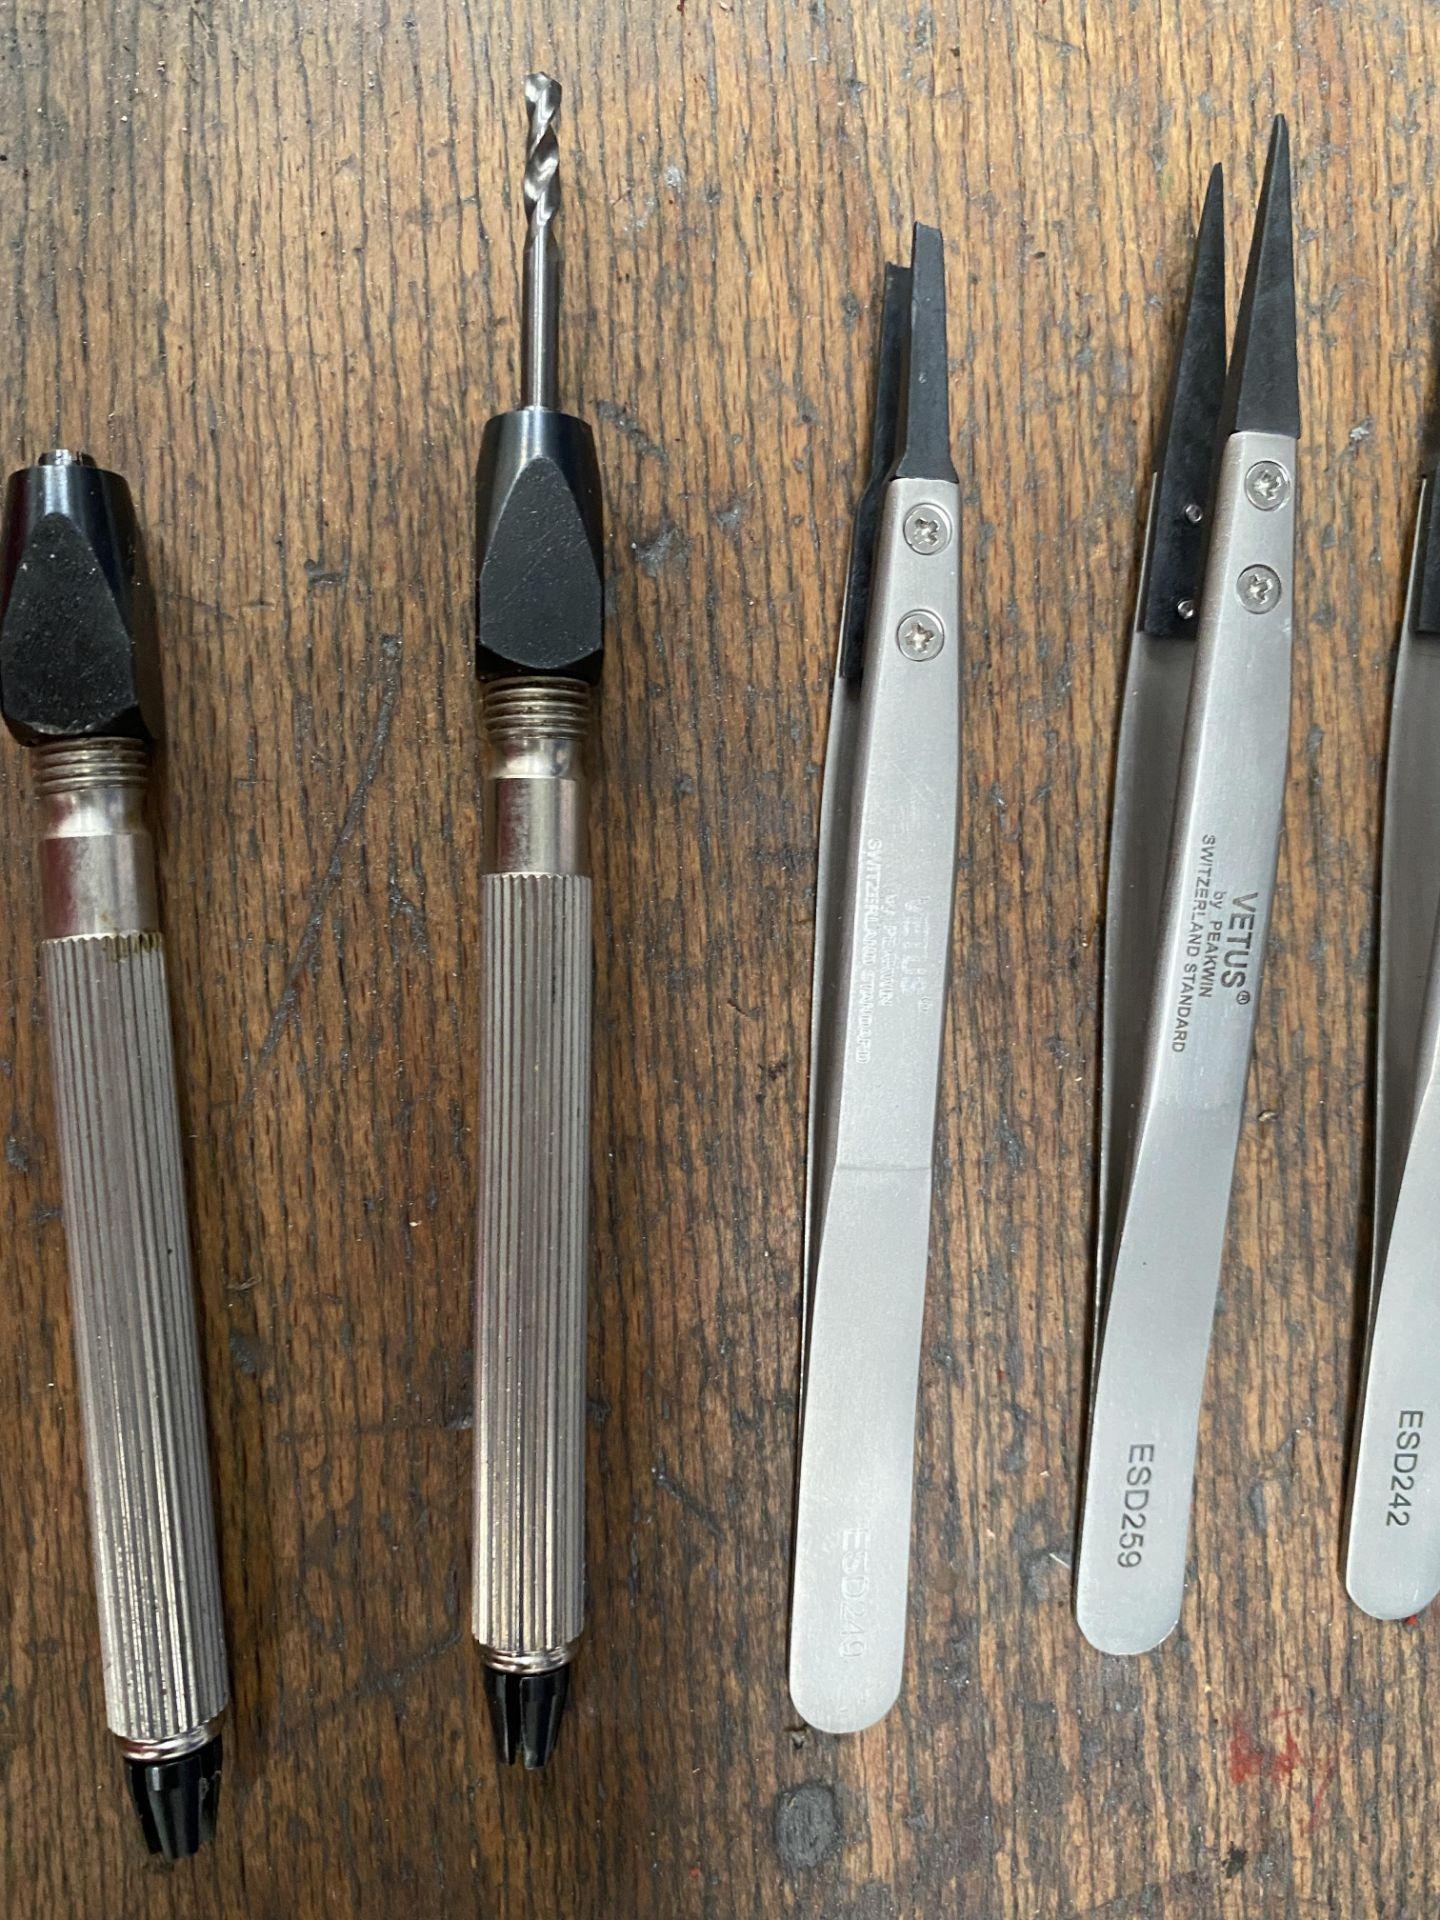 Assorted Vetus Precision Tools & Files - Image 4 of 8